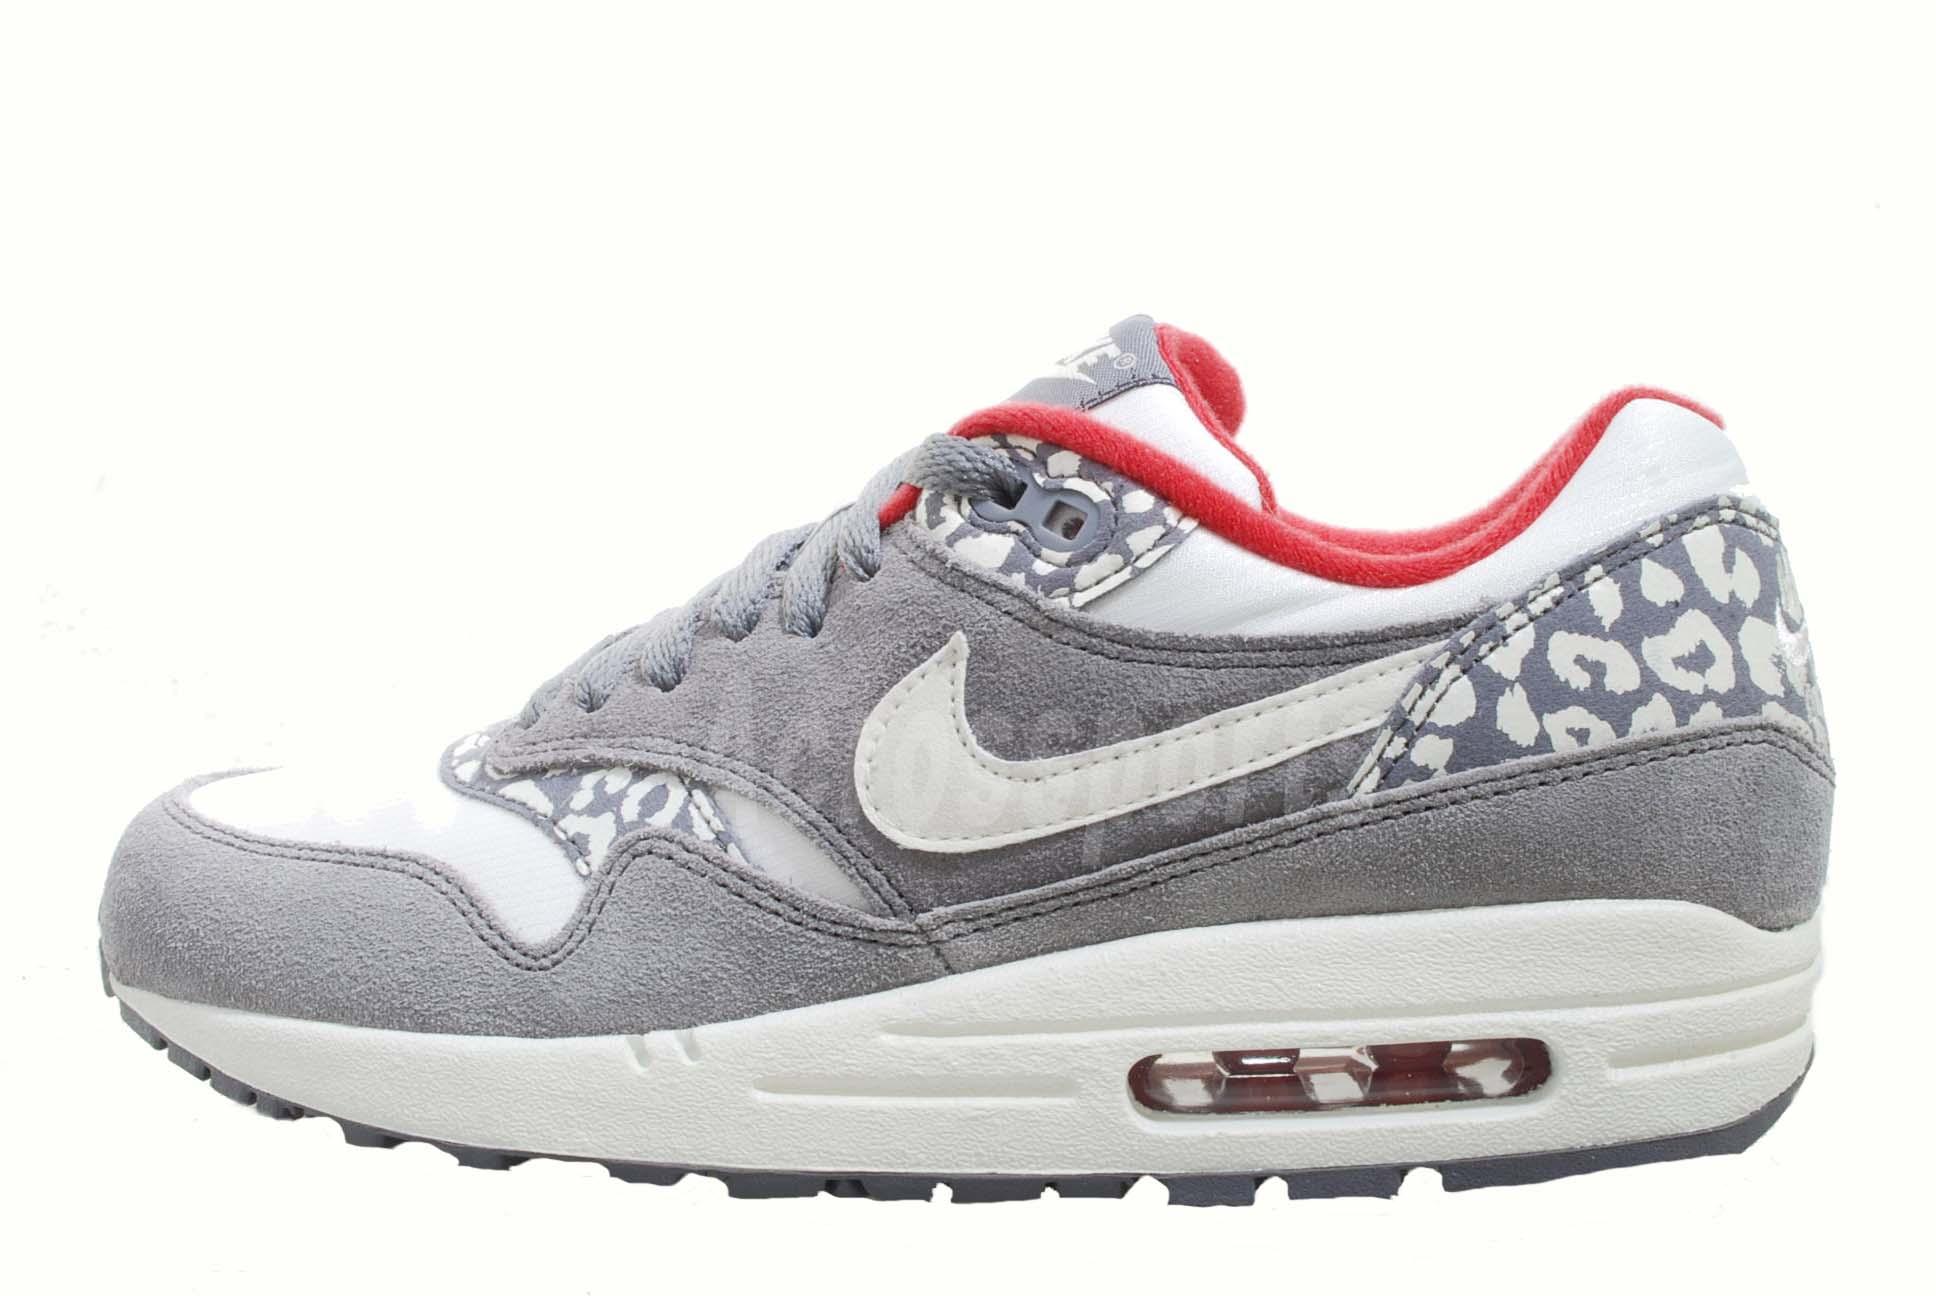 nike wmns air max 1 leopard charcoal sail womens running shoes atomos 319986 099 ebay